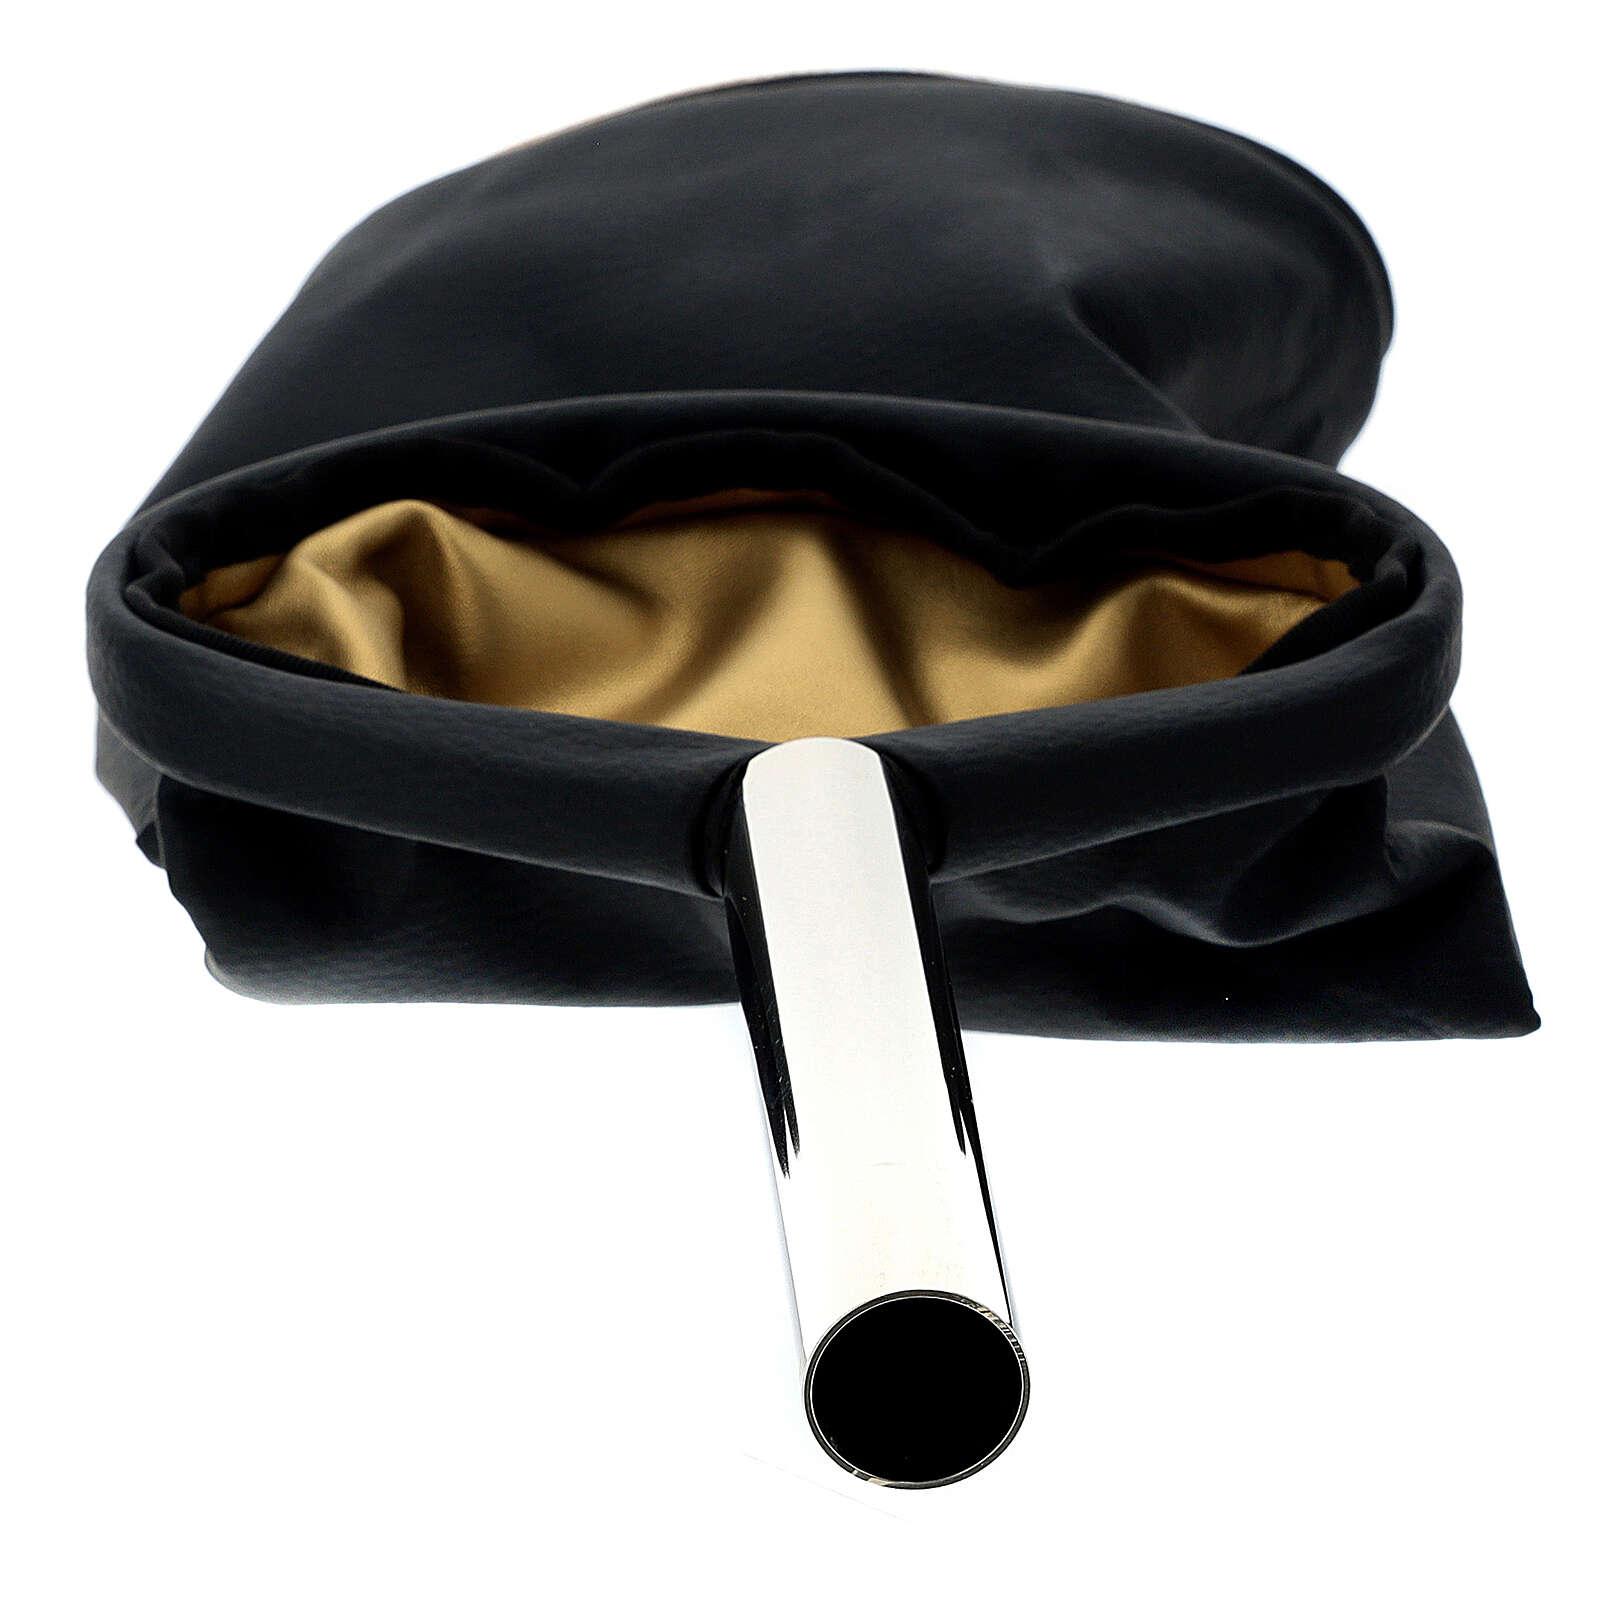 Alms bag, reversible golden and black 3